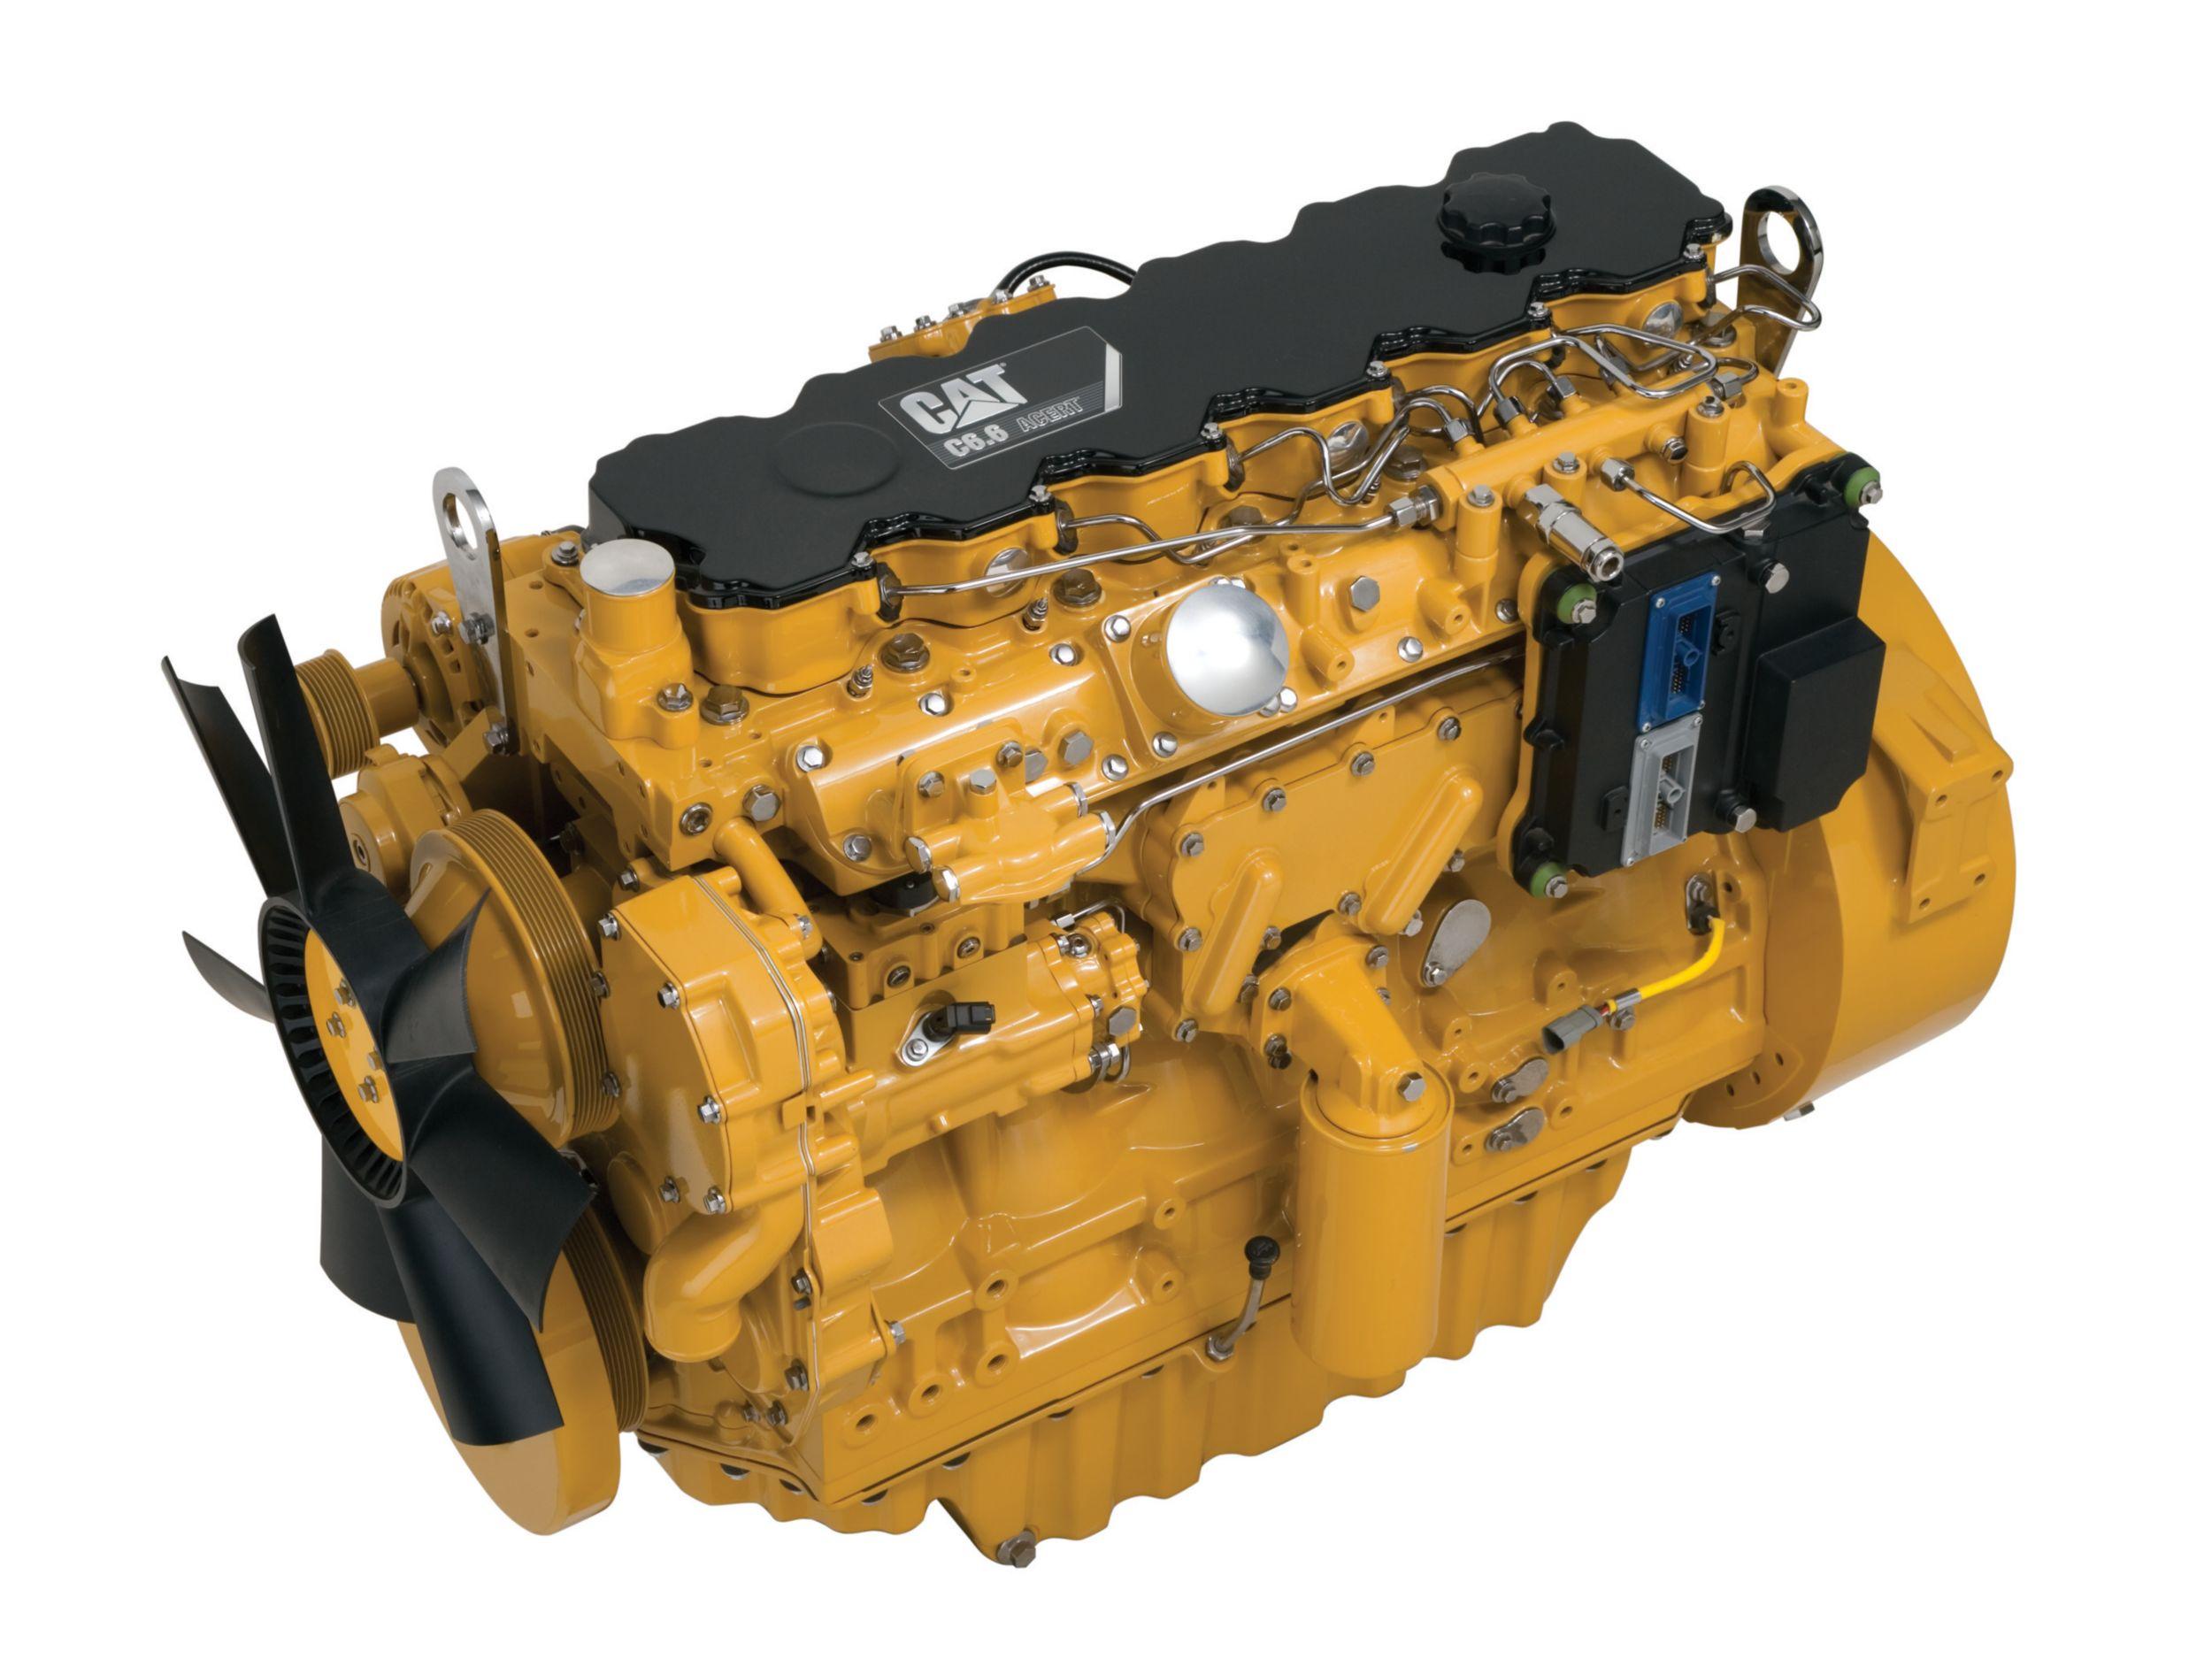 Motores Diésel C6.6 ACERT Tier4: altamente regulados